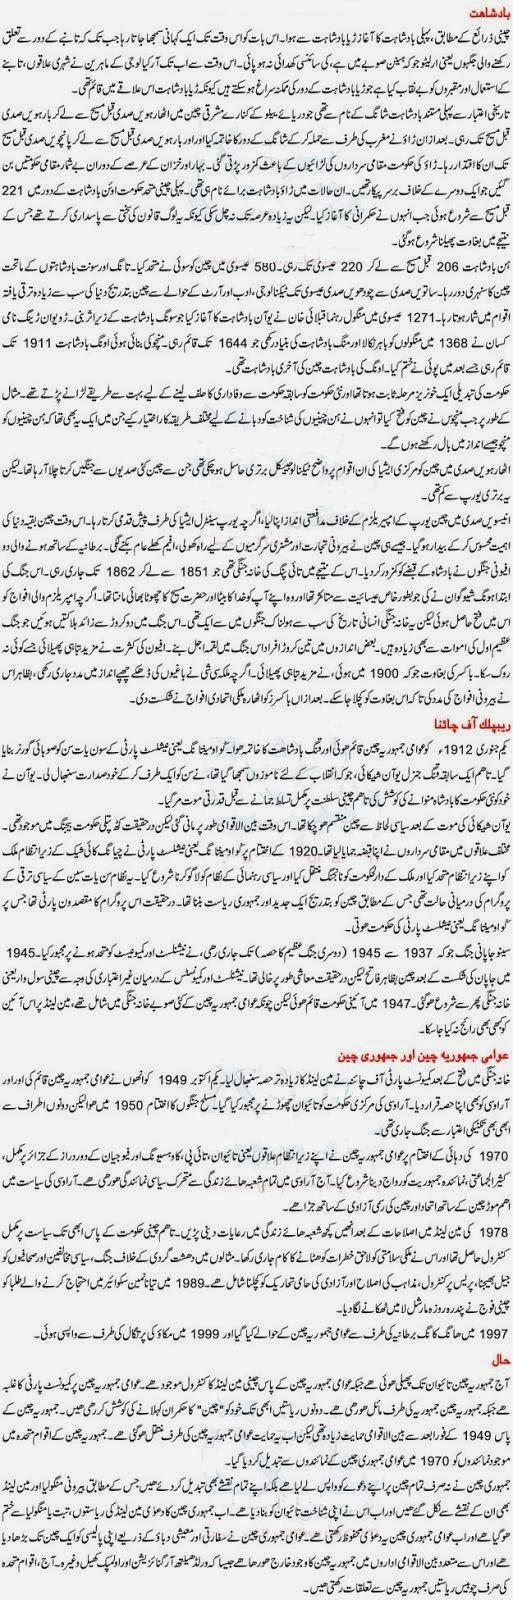 Historyblog History Of China In Urdu